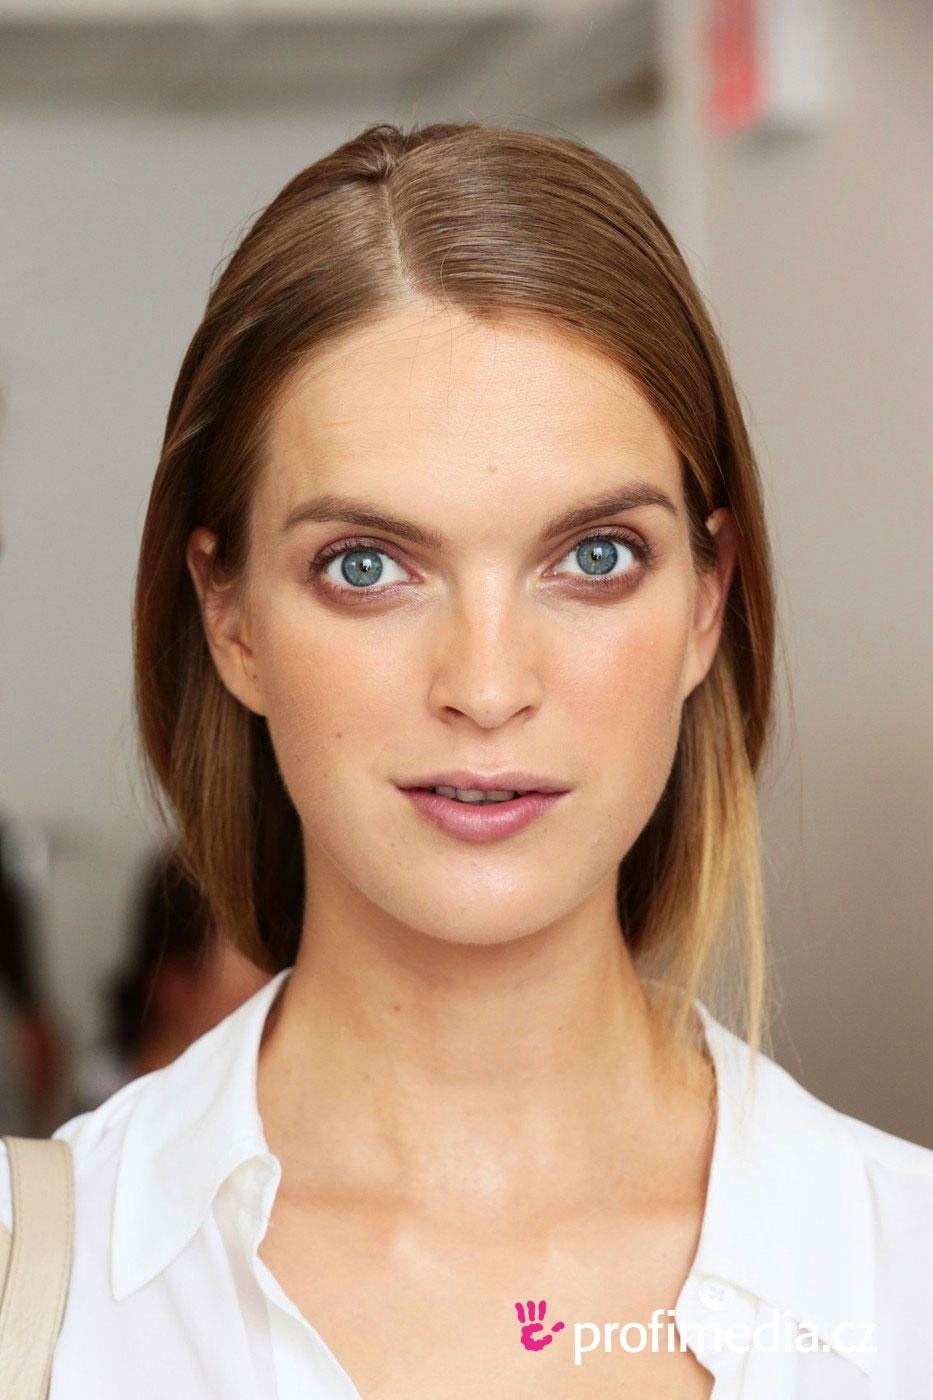 Natalie rabatesi coiffure happyhair for Miroir virtuel coiffure